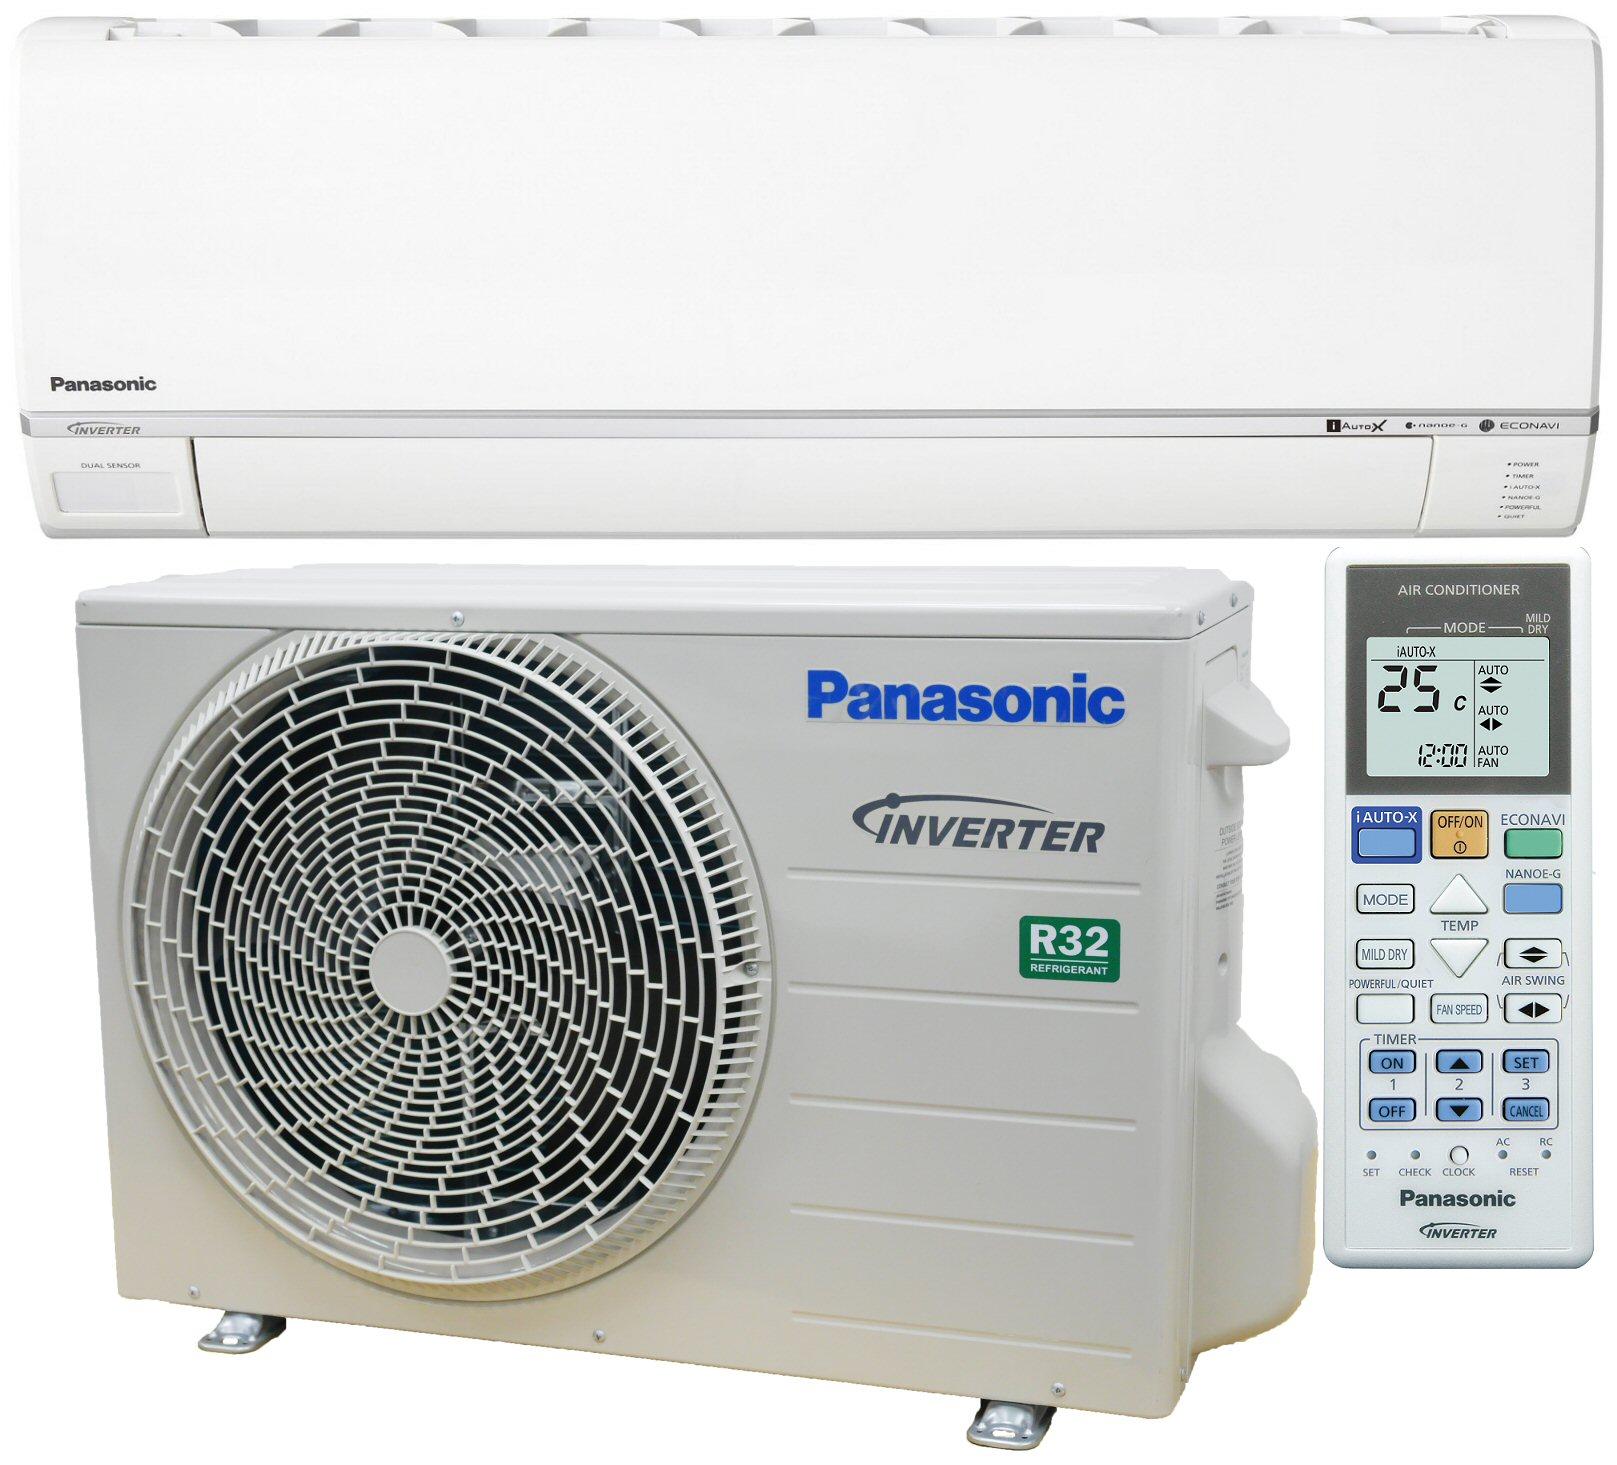 Panasonic Z7RKR-Z12RKR.jpg